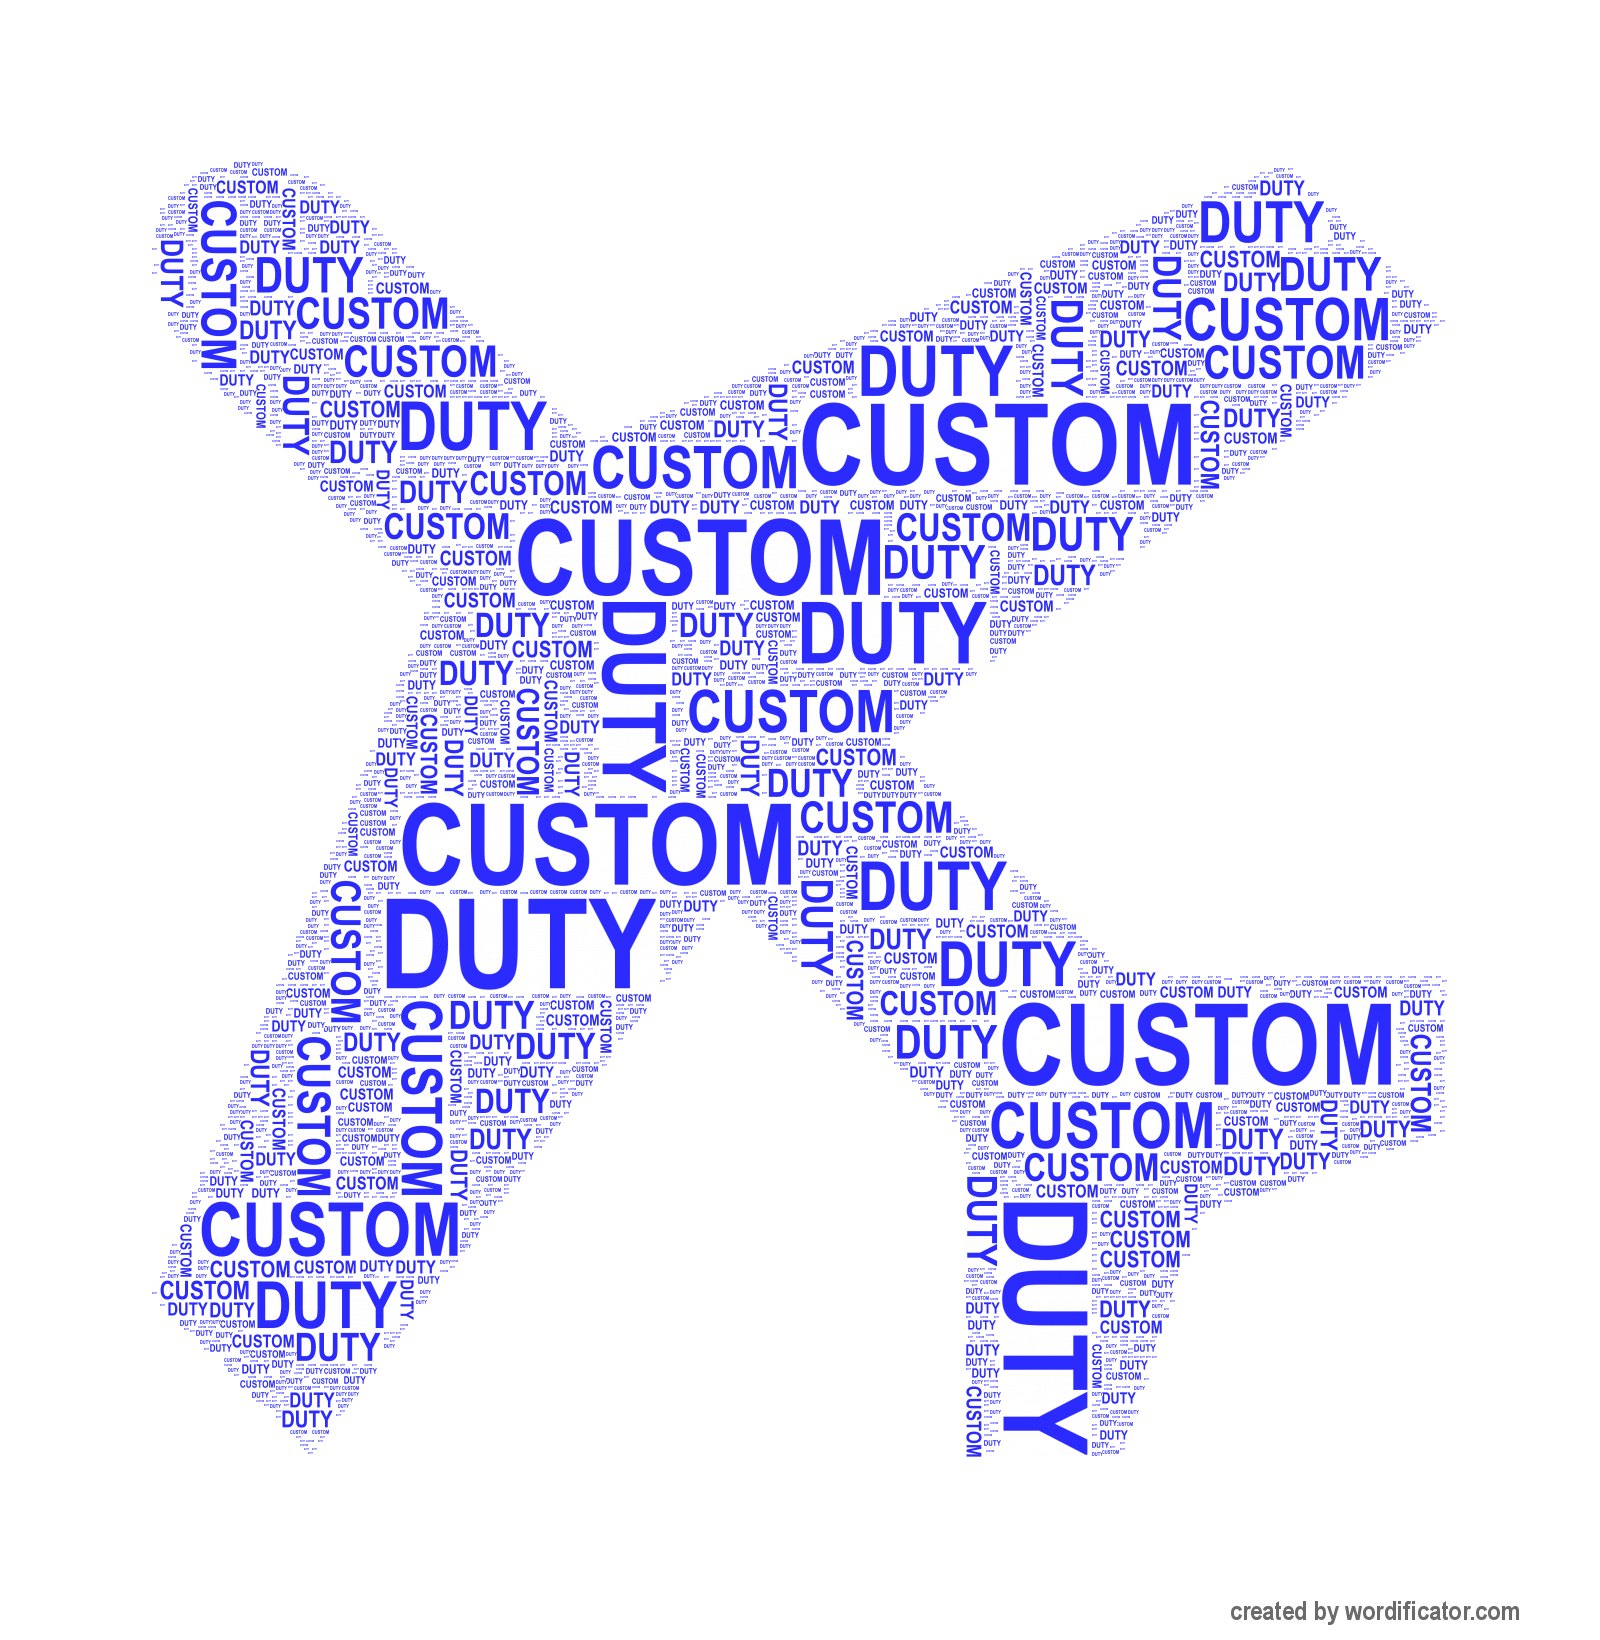 Custom Duty Online Income